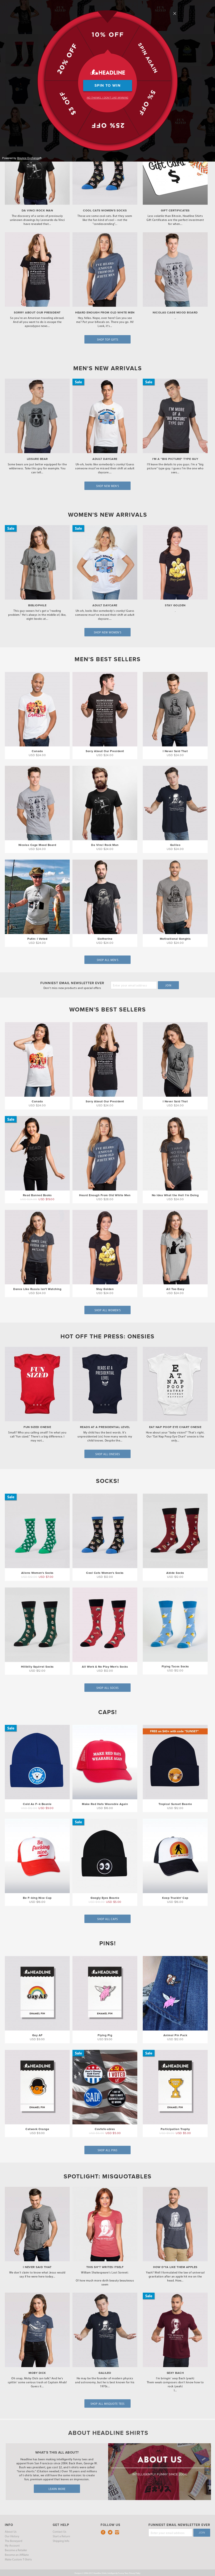 ba6fa4ec Headline Shirts Competitors, Revenue and Employees - Owler Company Profile